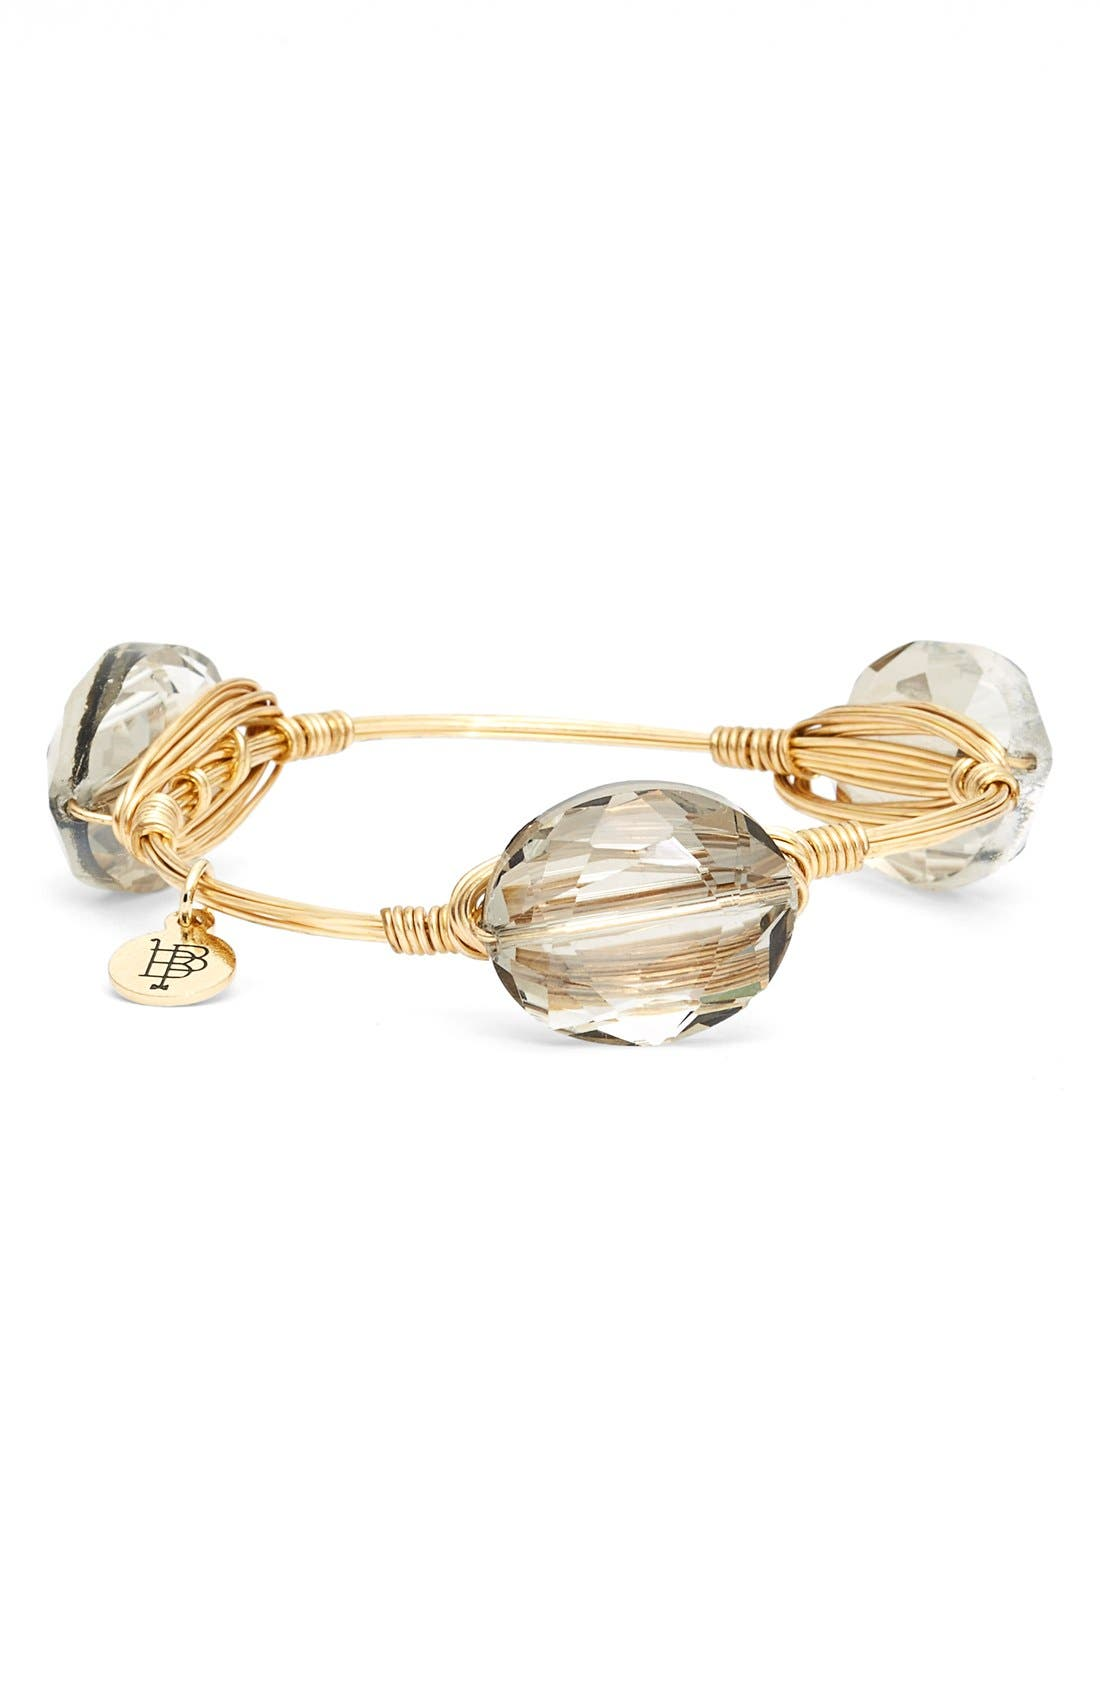 'Tiger's Eye Agate & Jet Acrylic Crystal' Stone Bracelets,                             Alternate thumbnail 5, color,                             200